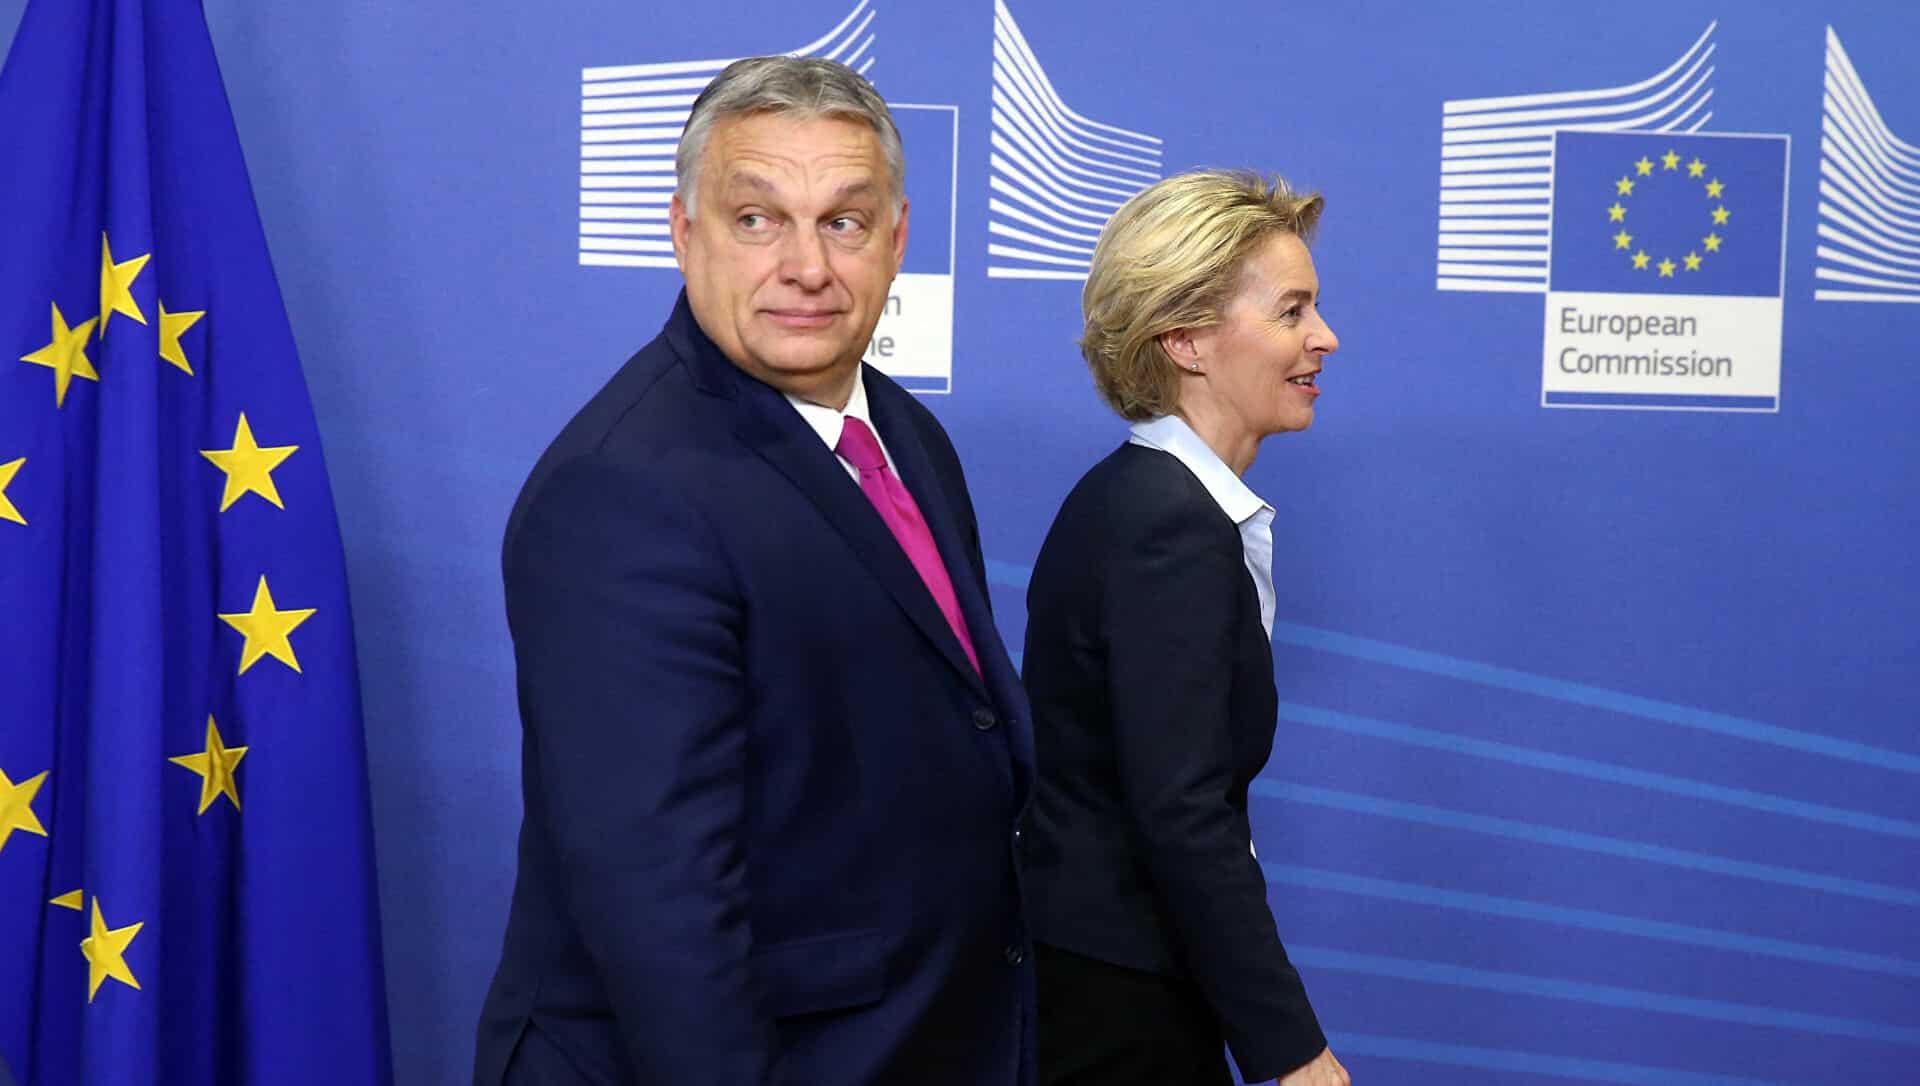 Viktor Orbán: Bruxelles e vinovat de creșterea prețurilor la energie – 60m.ro